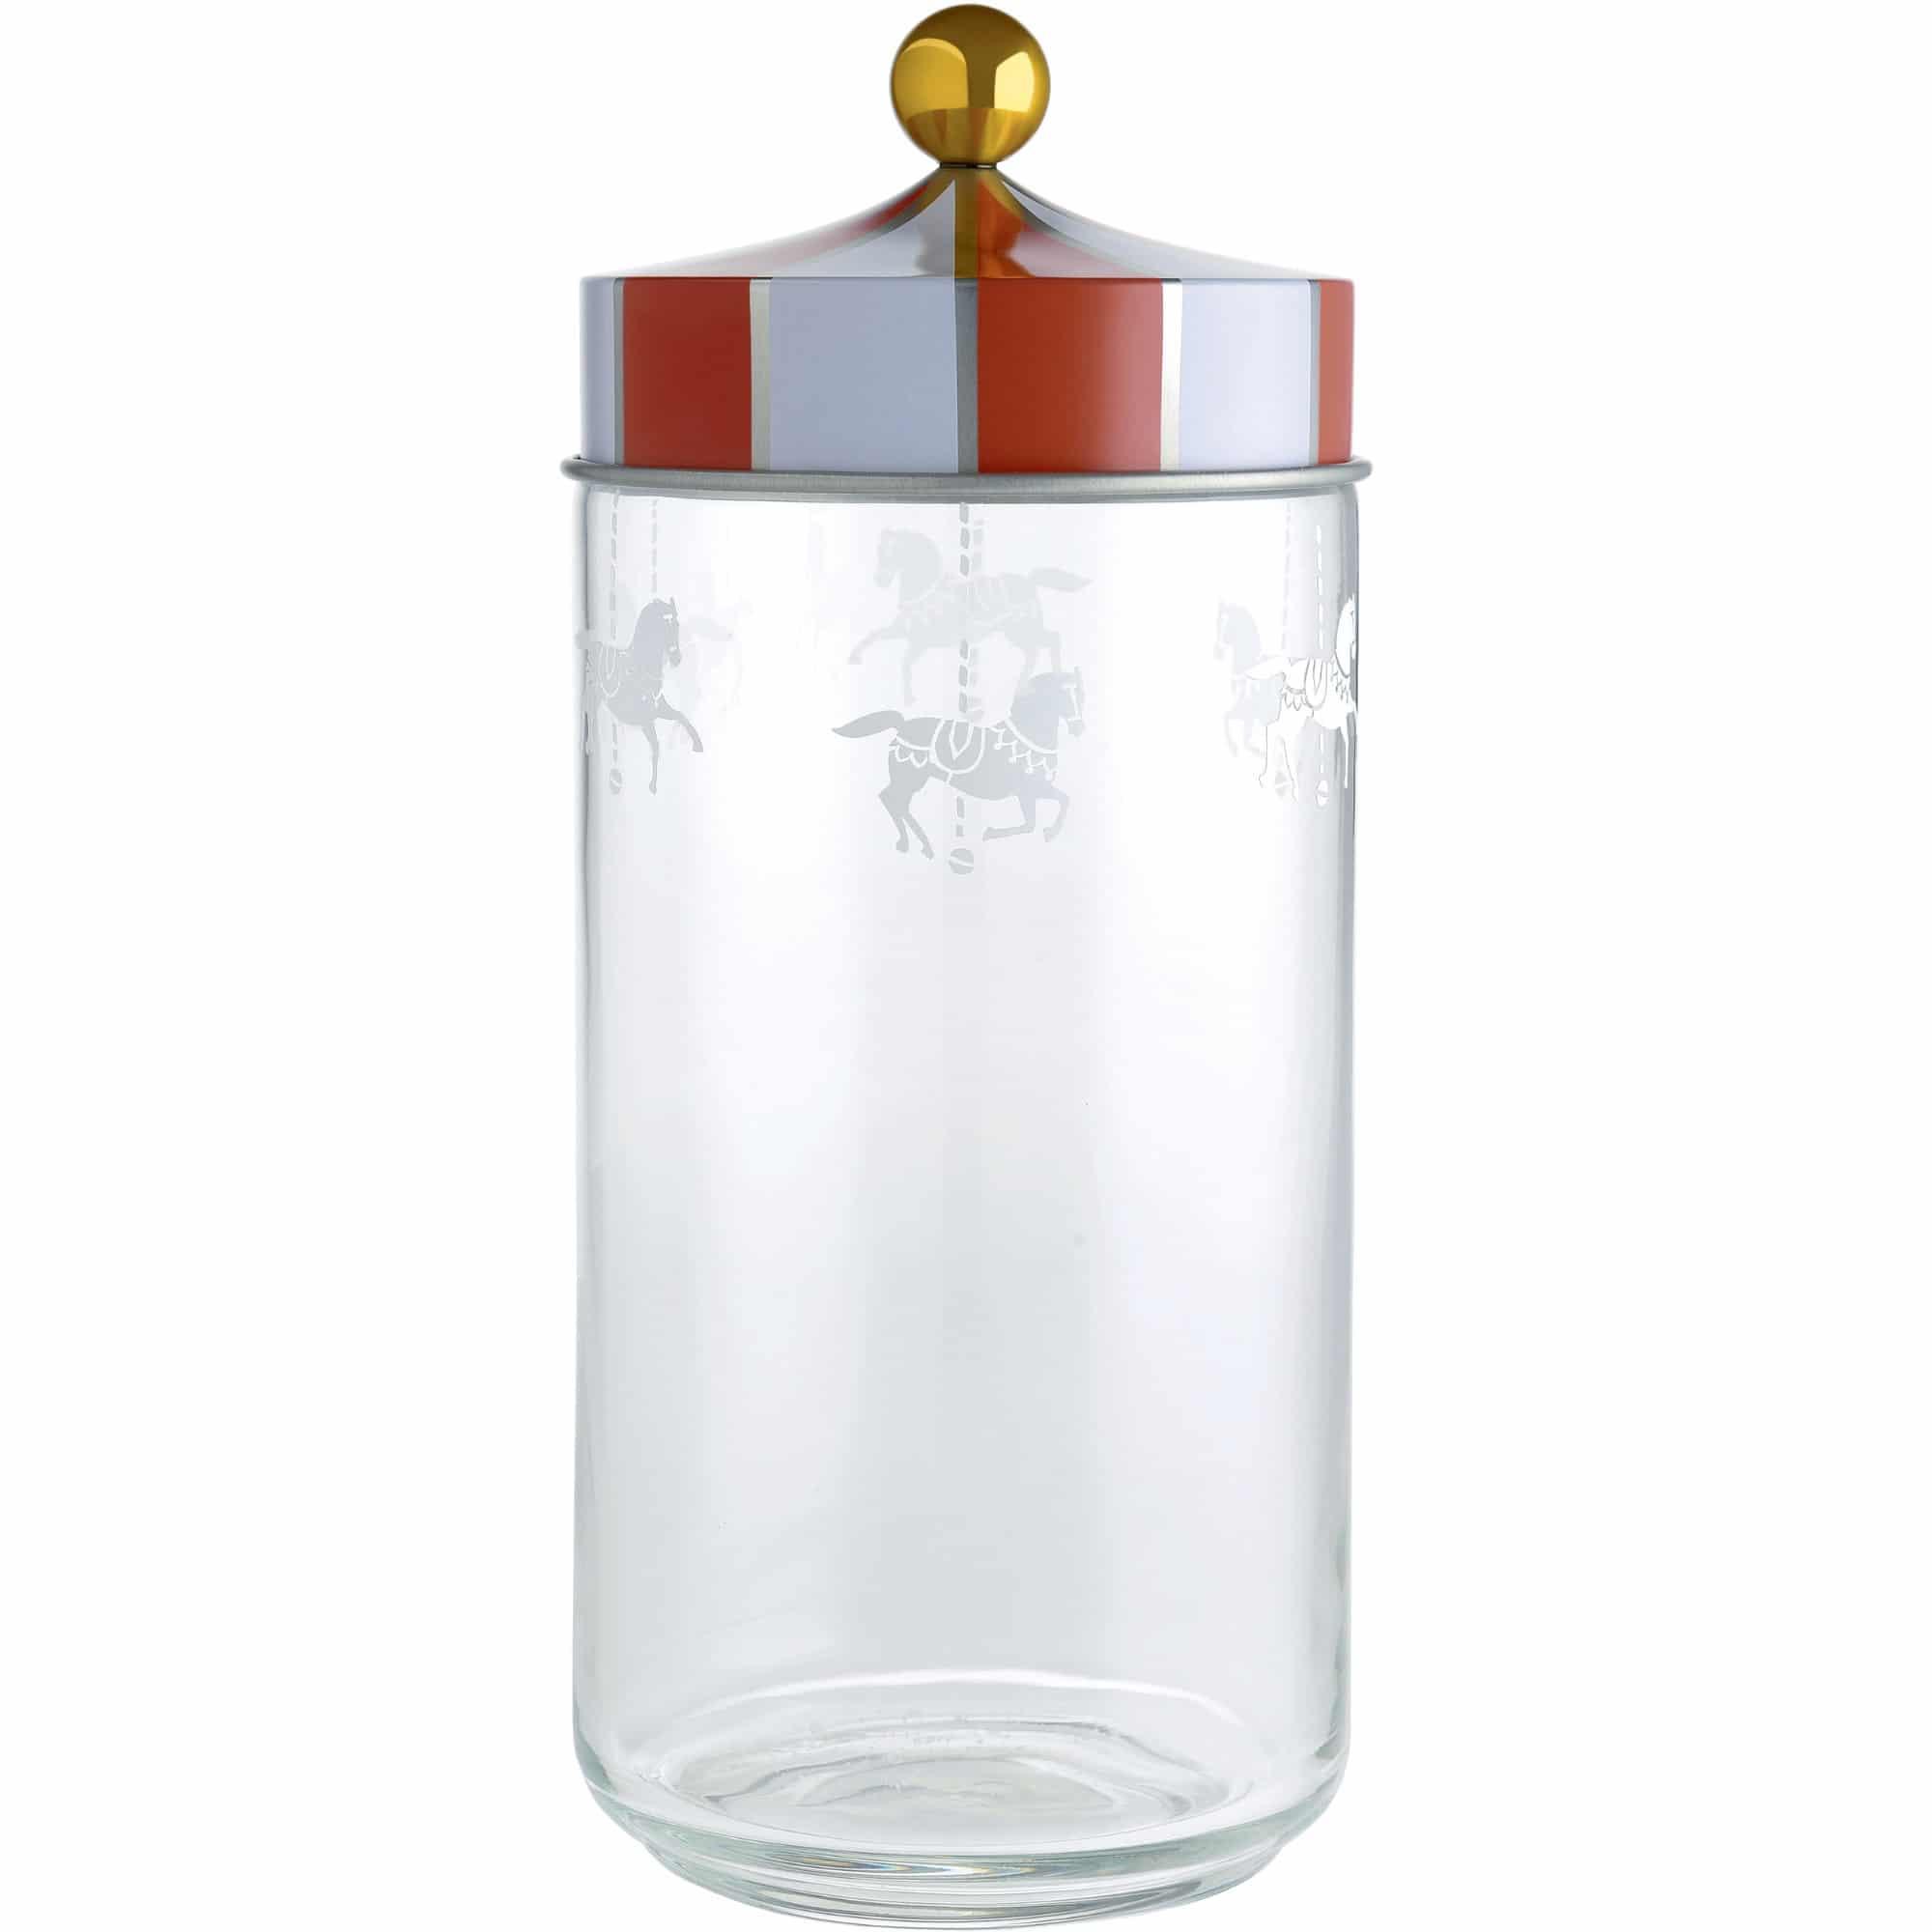 Alessi Circus Glasburk med Hermetiskt lock 150 cl